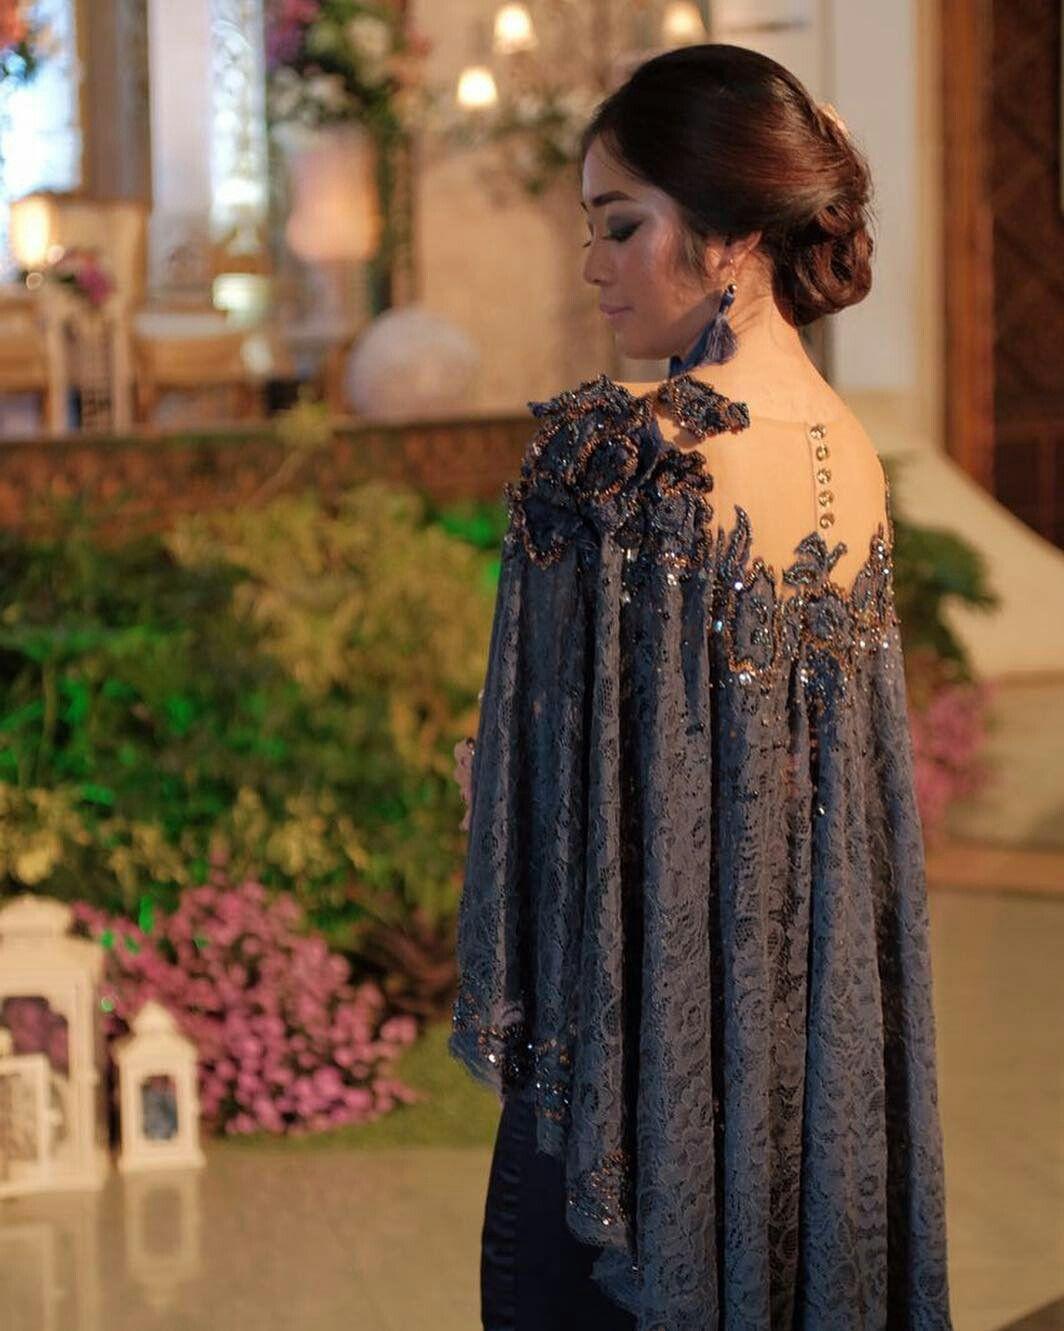 Batik dress for wedding party  Find More at udue feedproxygoogleramazingoutfits